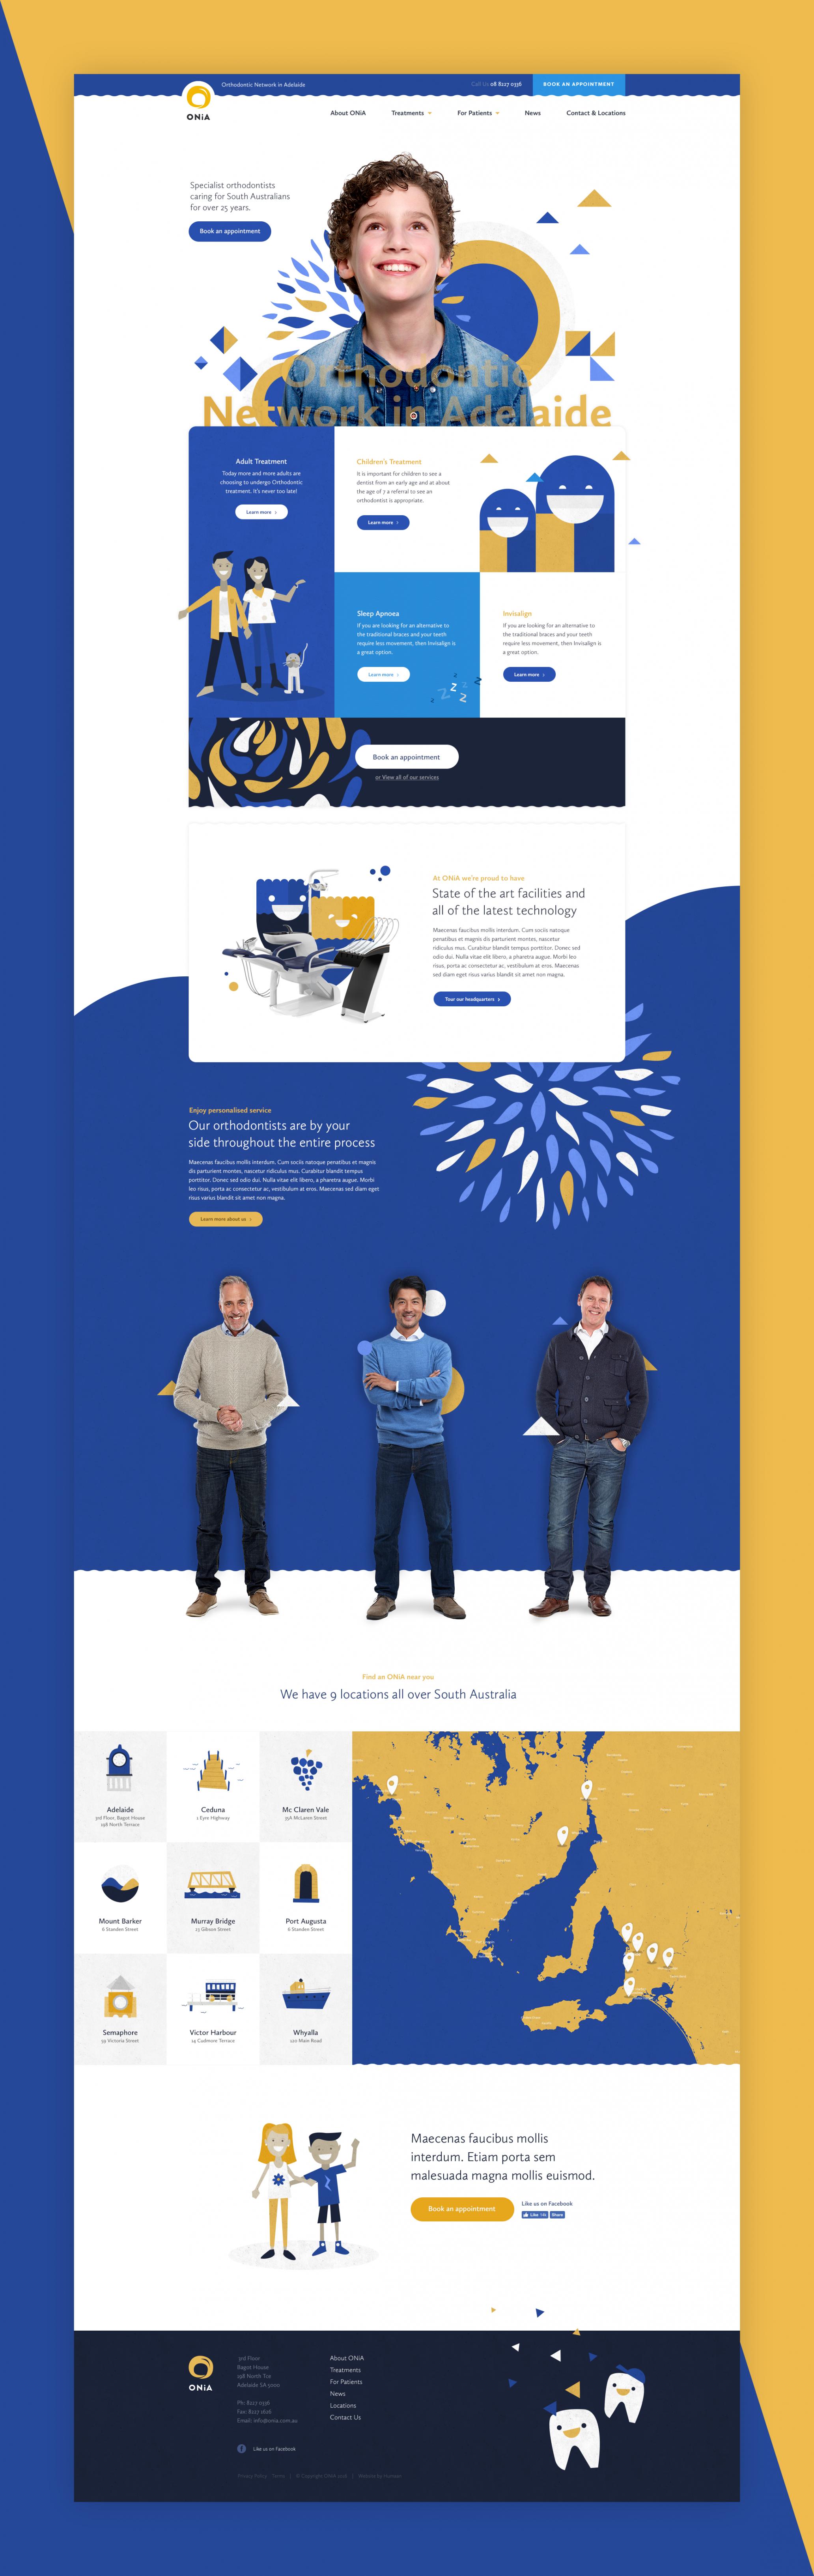 Voice Design Adelaide Hills Winery Web Design Web Design Resources Design